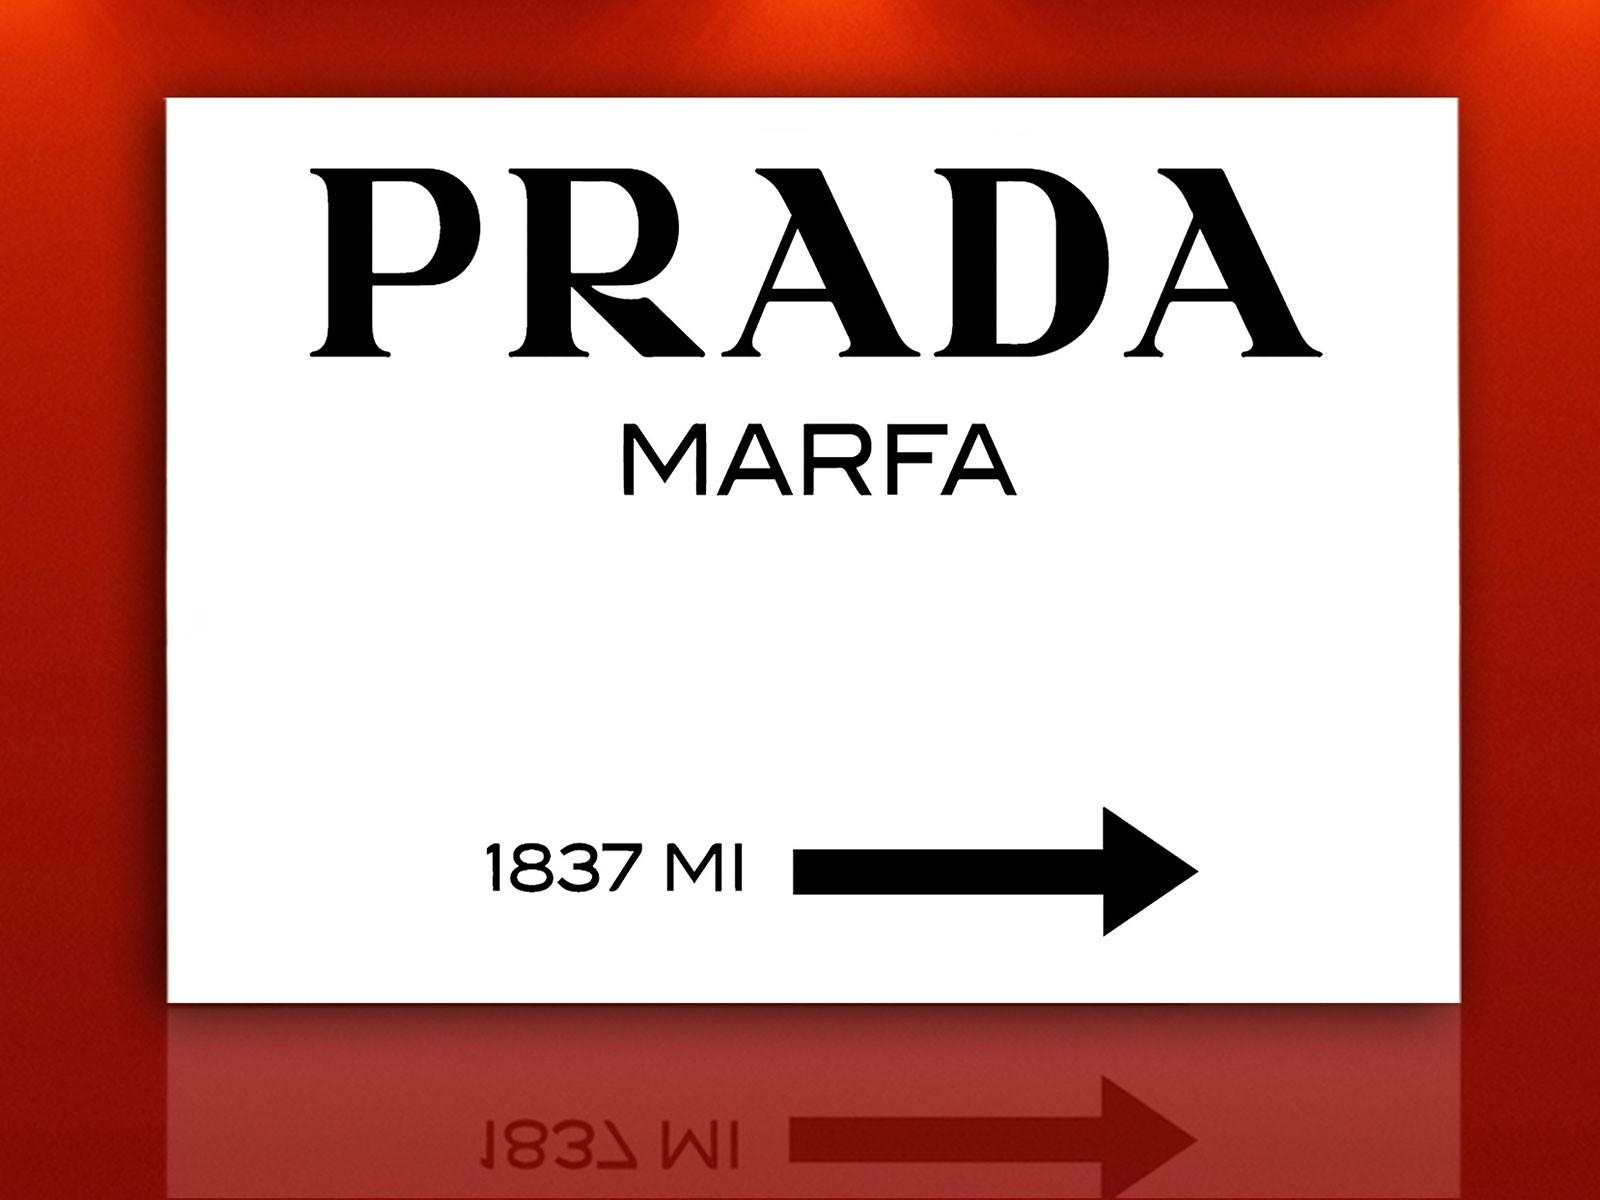 Prada Marfa Gossip Girl, Stampa Su Tela Canvas With Regard To Prada Marfa Wall Art (Image 15 of 20)